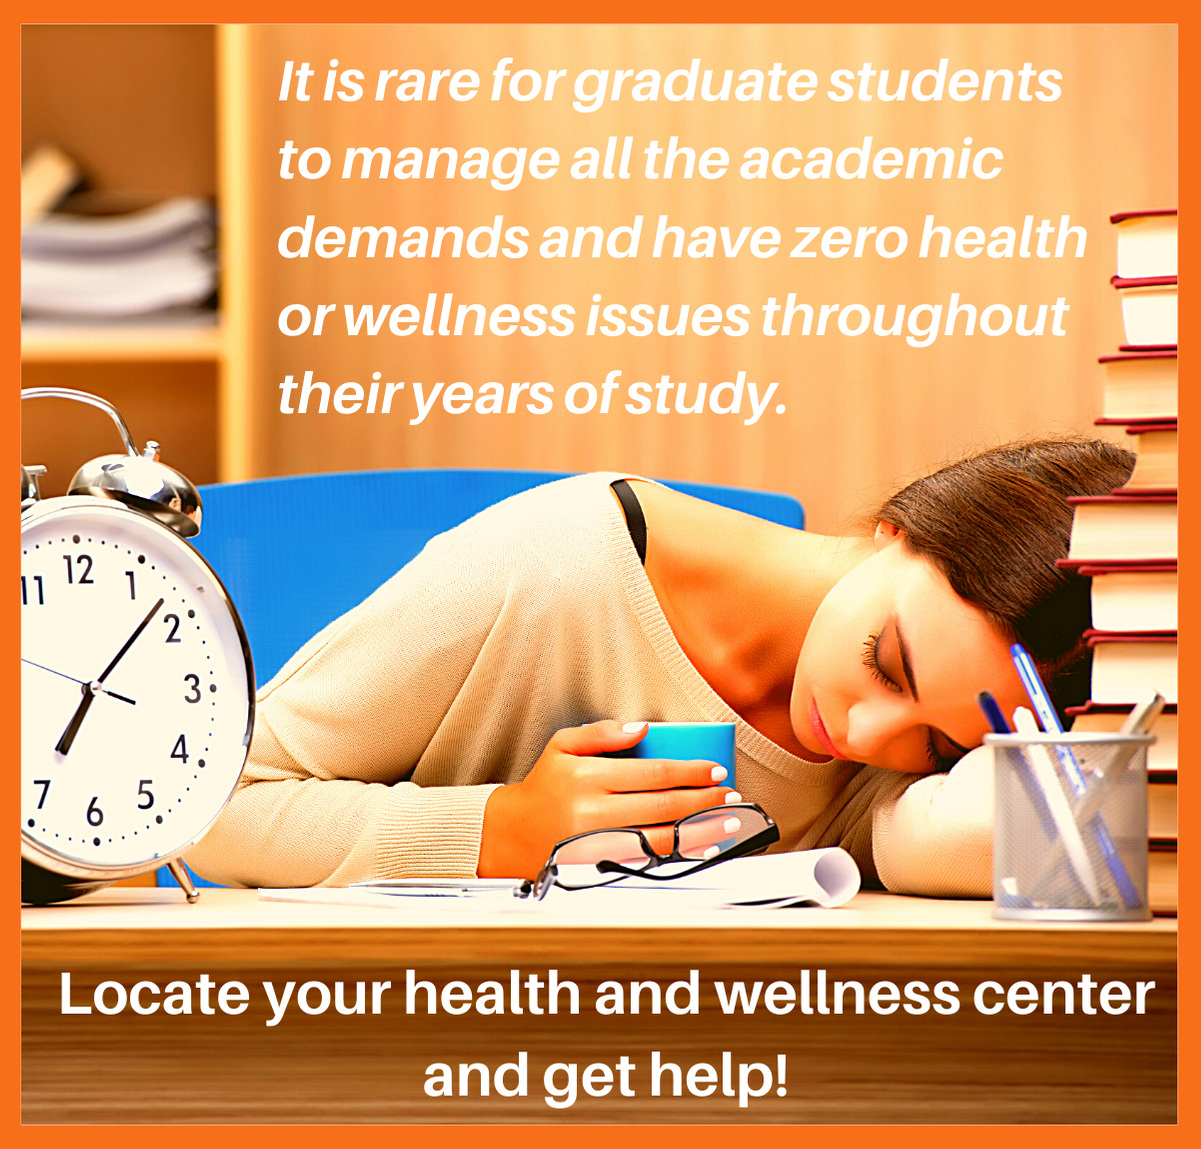 campus resources fact 1